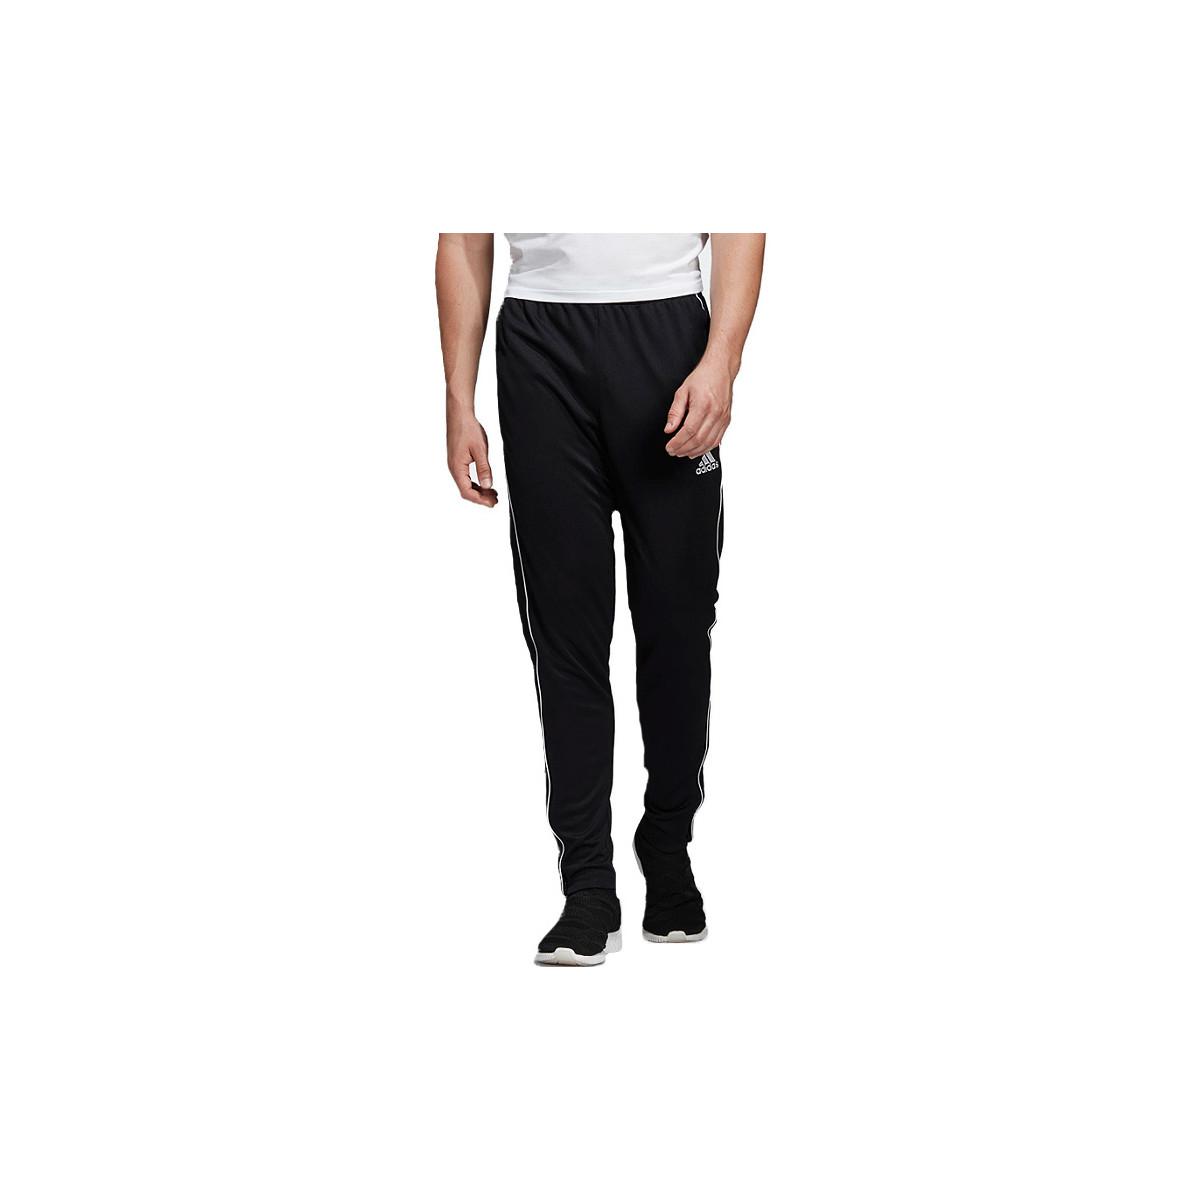 Joggingtøj / Træningstøj adidas  Core 18 Training Pants CE9036